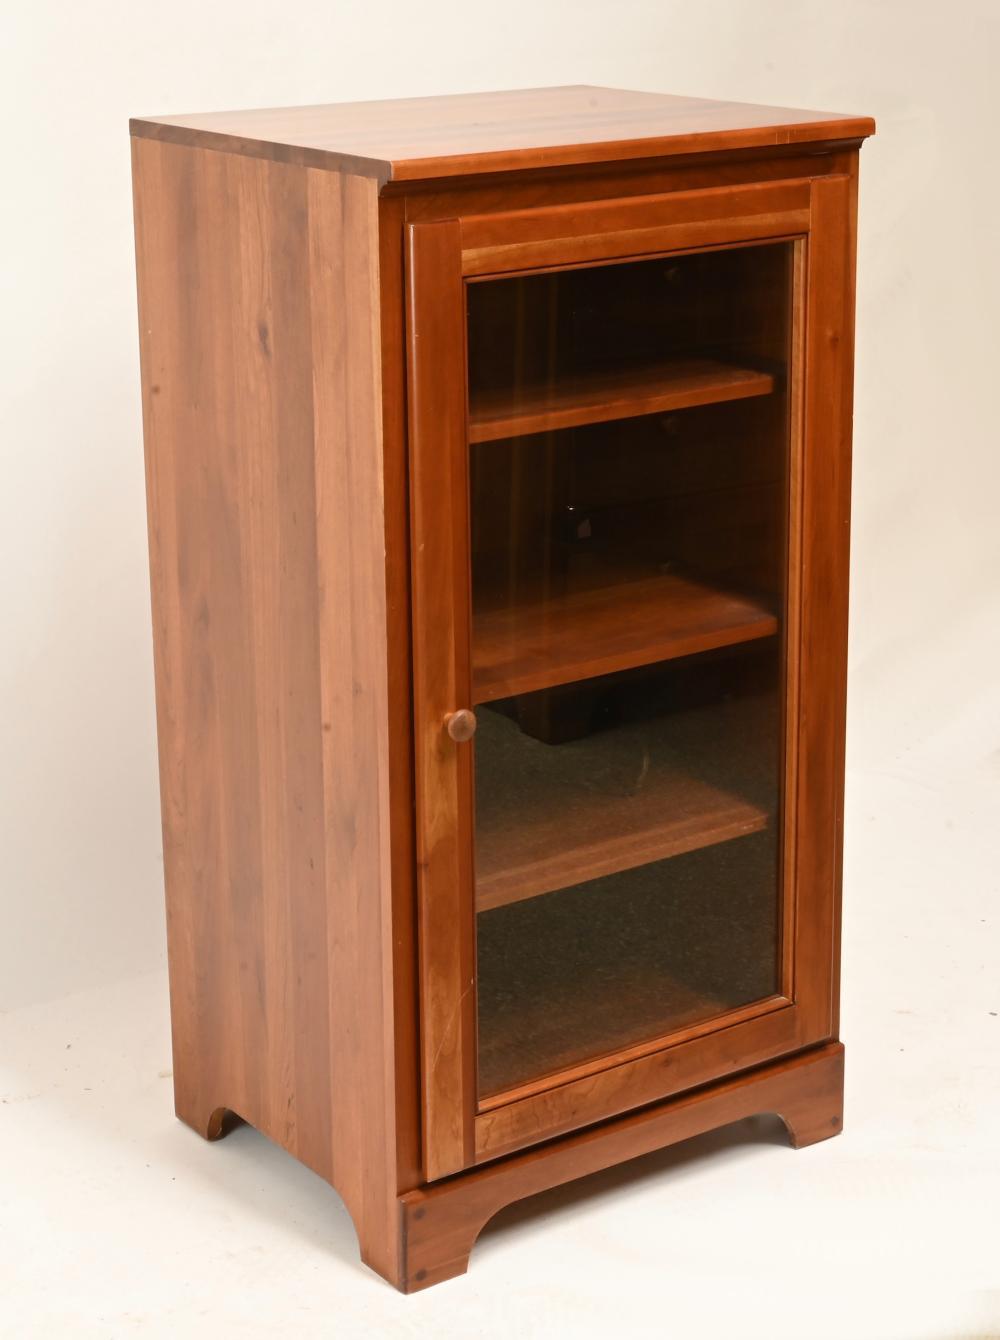 Nichols And Stone Furniture Cherry Cabinet